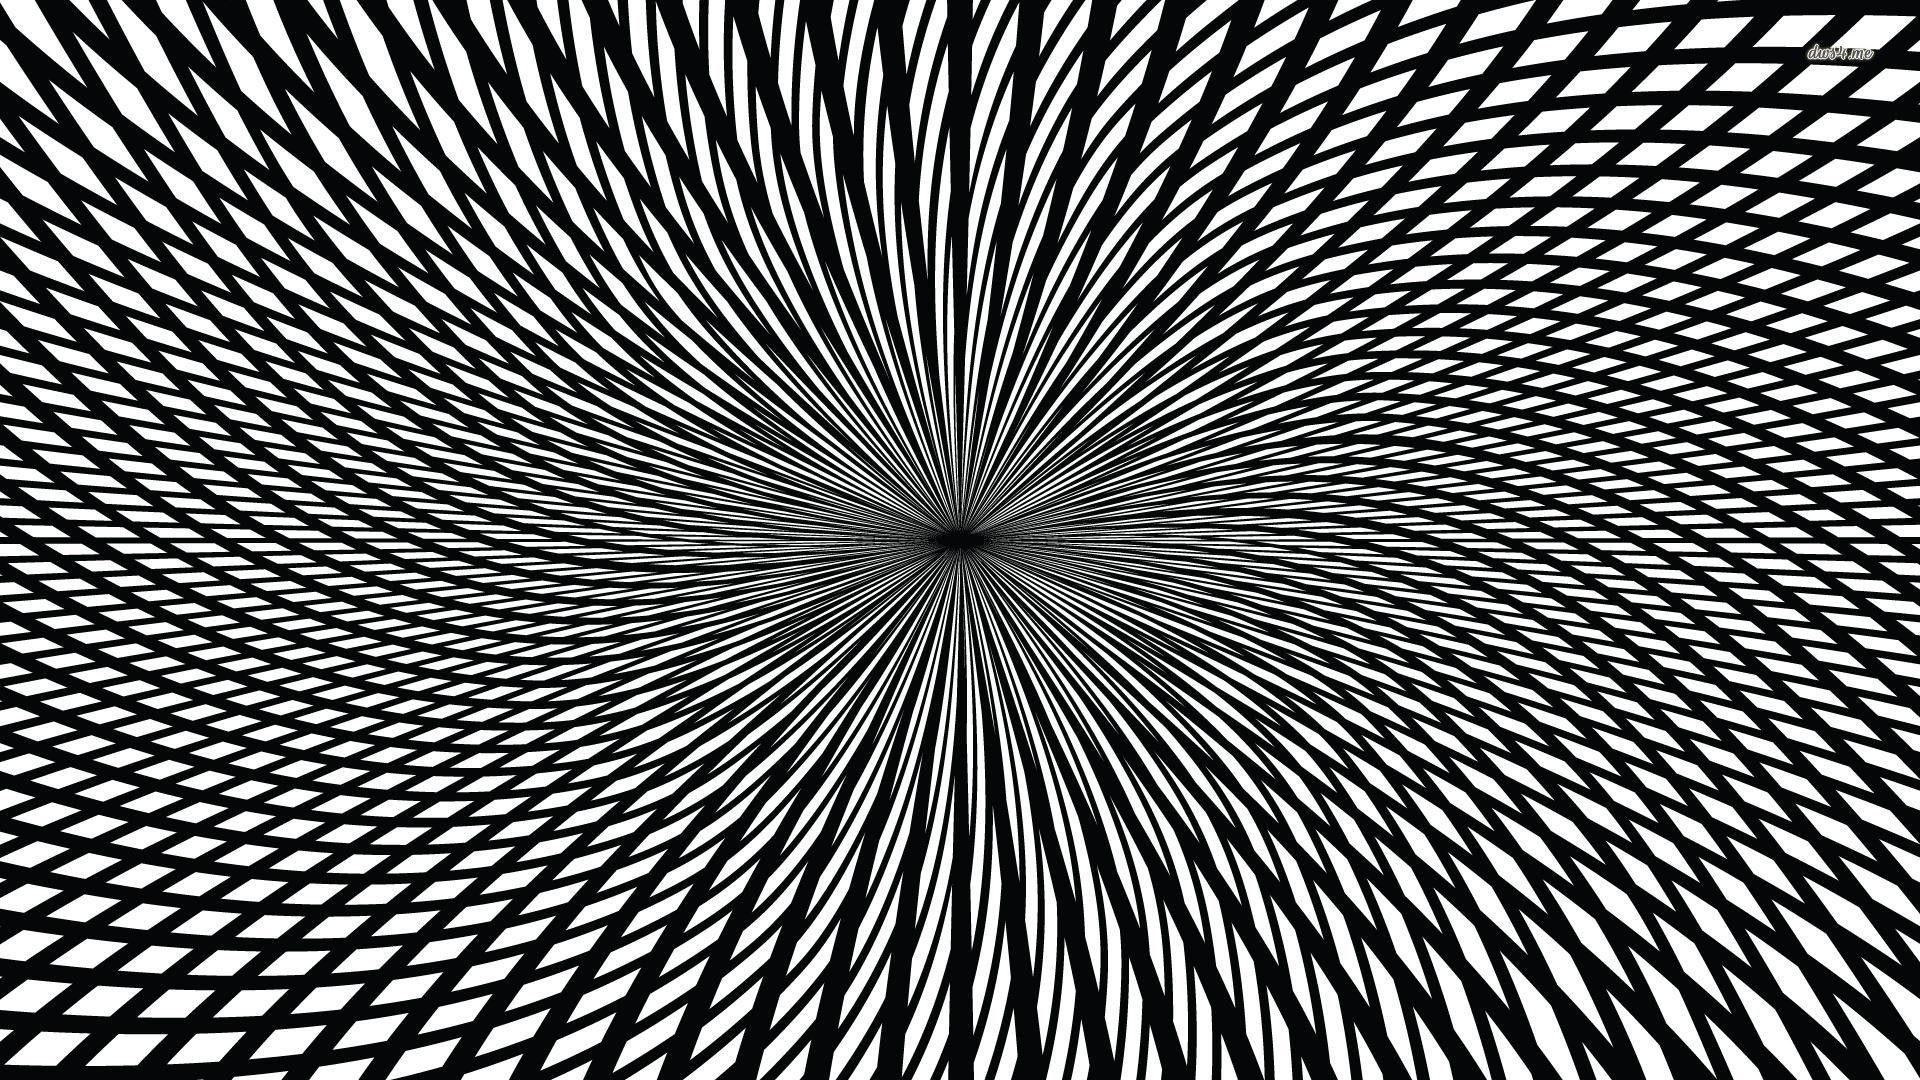 Optical Illusion Hd Wallpaper Optical Illusion Wallpaper Abstract Art Eyes